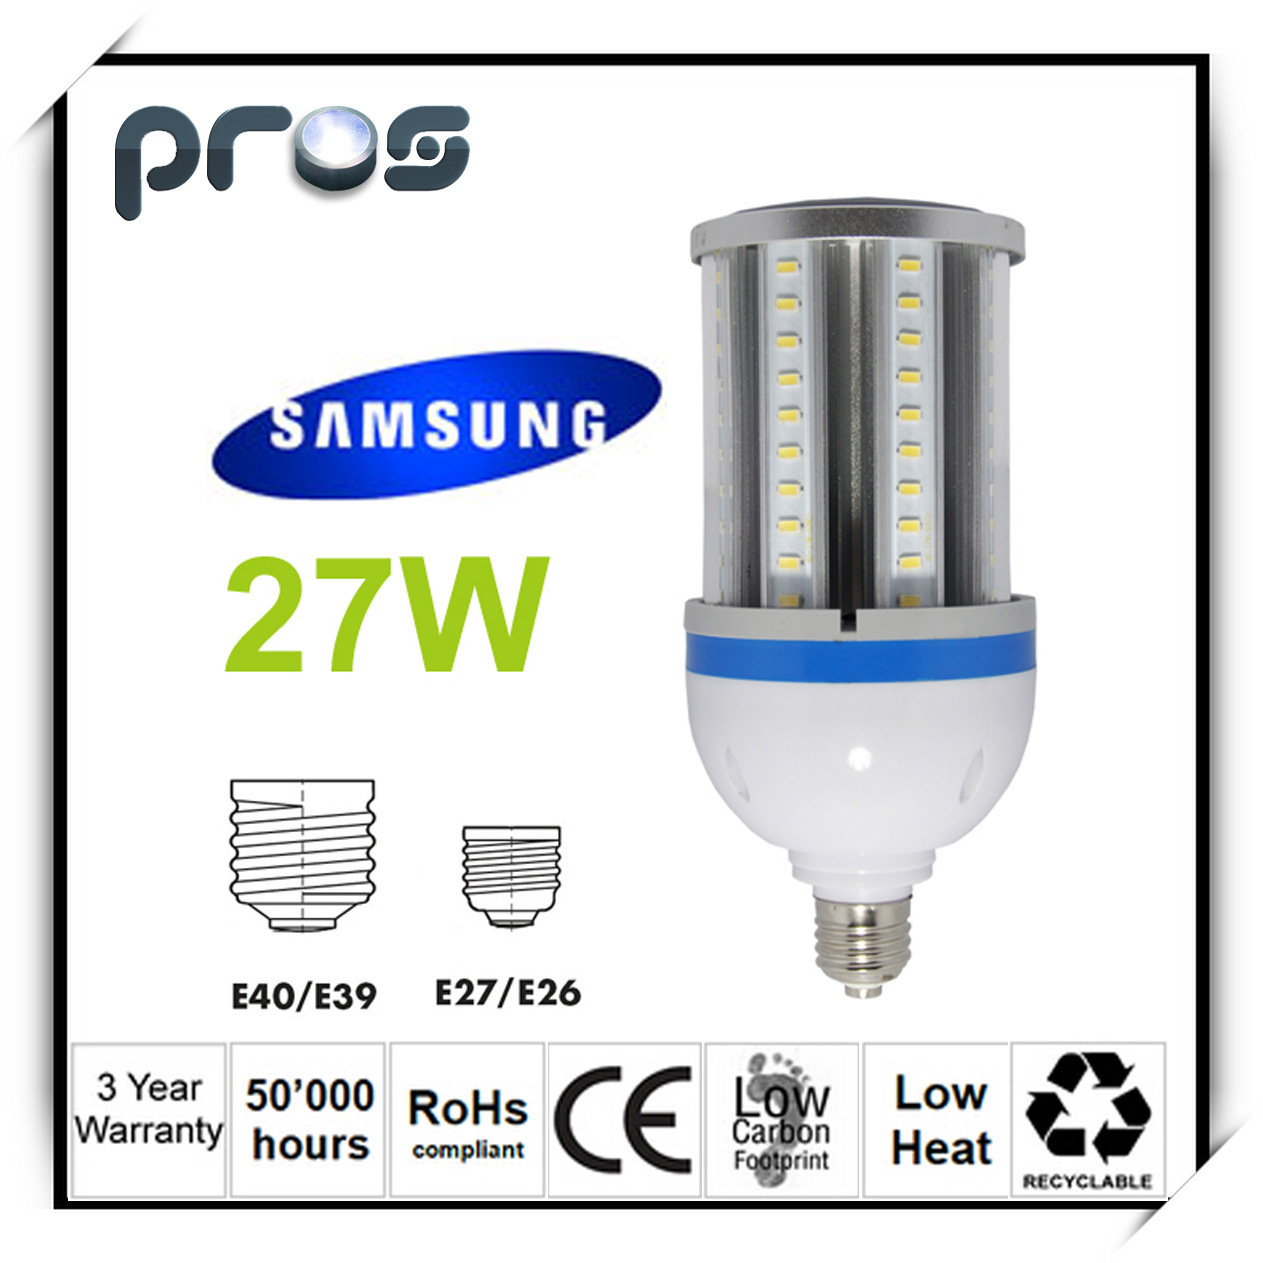 27W LED Corn Bulb Light with Samsung Epistar LED Chips